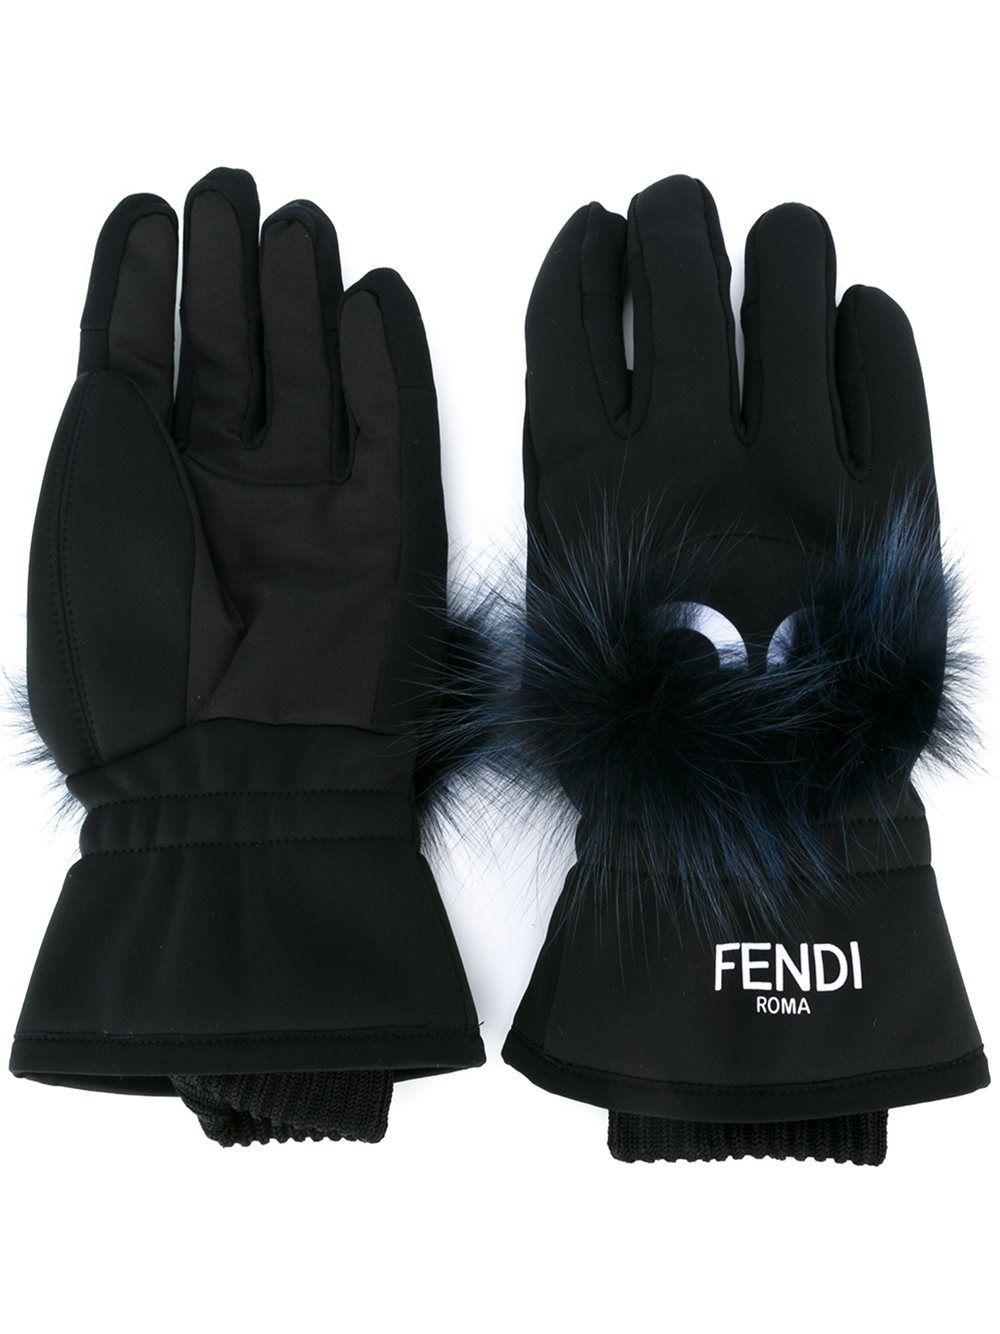 2ee6efb0c51a robe longue fendue jambe, Fendi gants Bag Bugs Femme Accessoires,fendi  france contact,